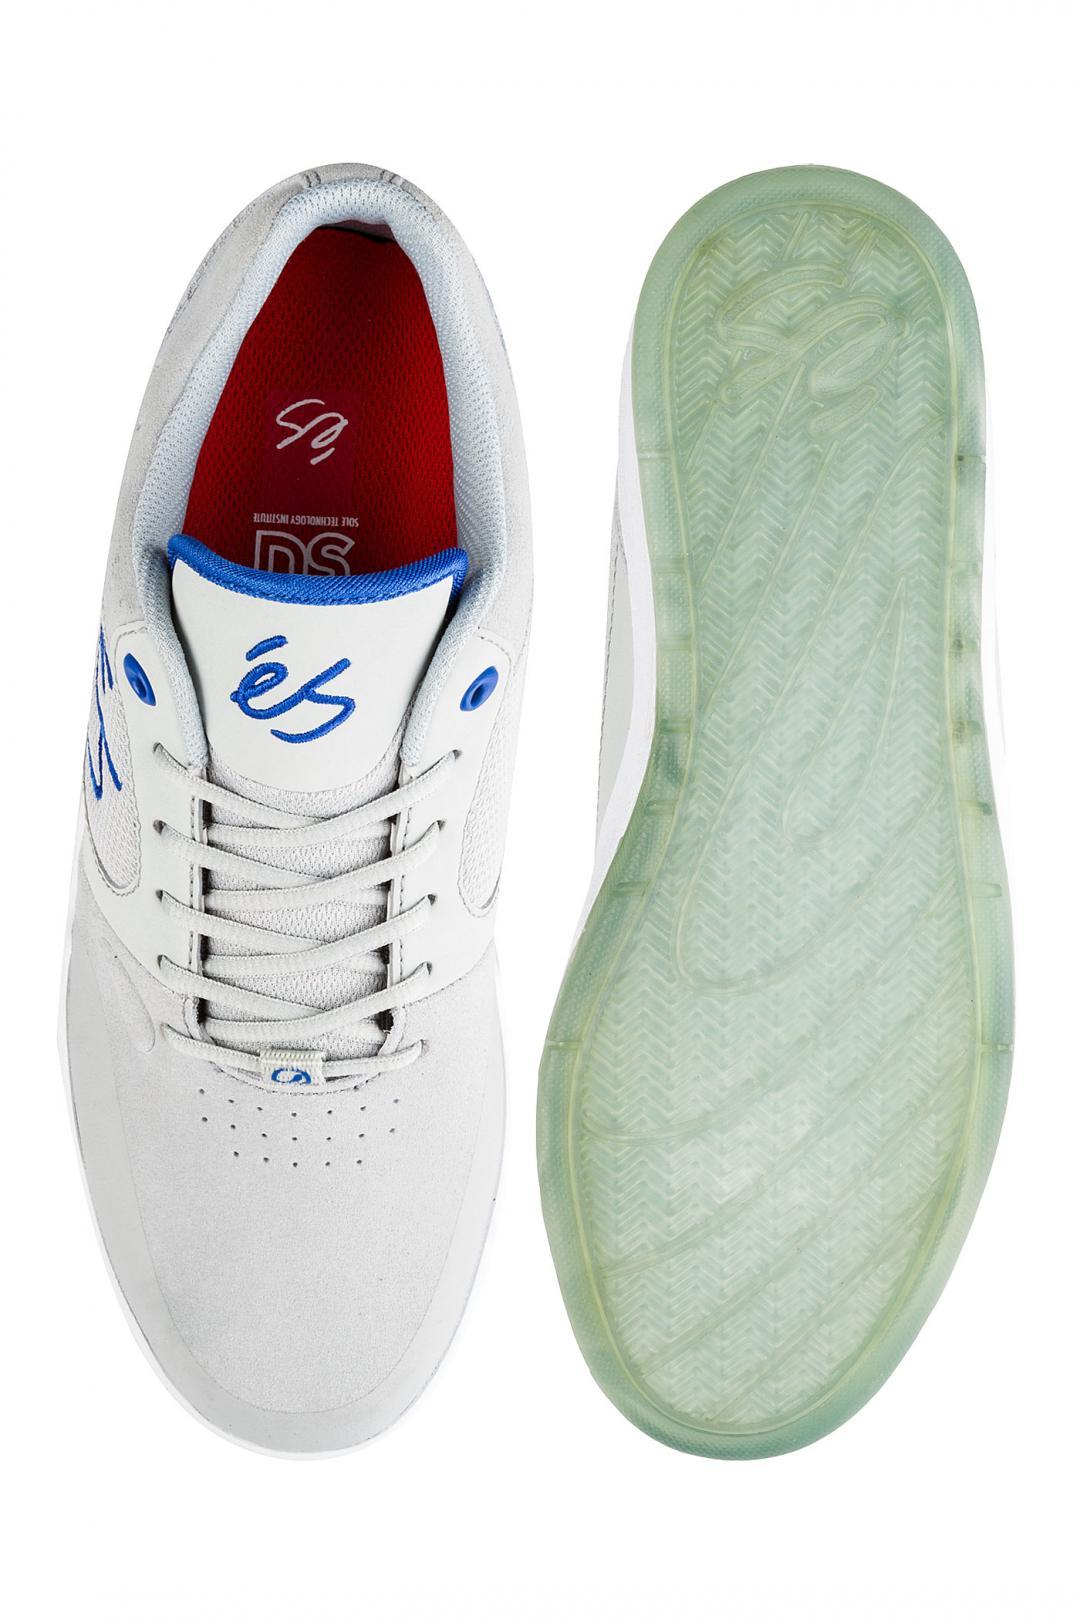 Uomo éS Swift 1.5 light grey | Sneaker